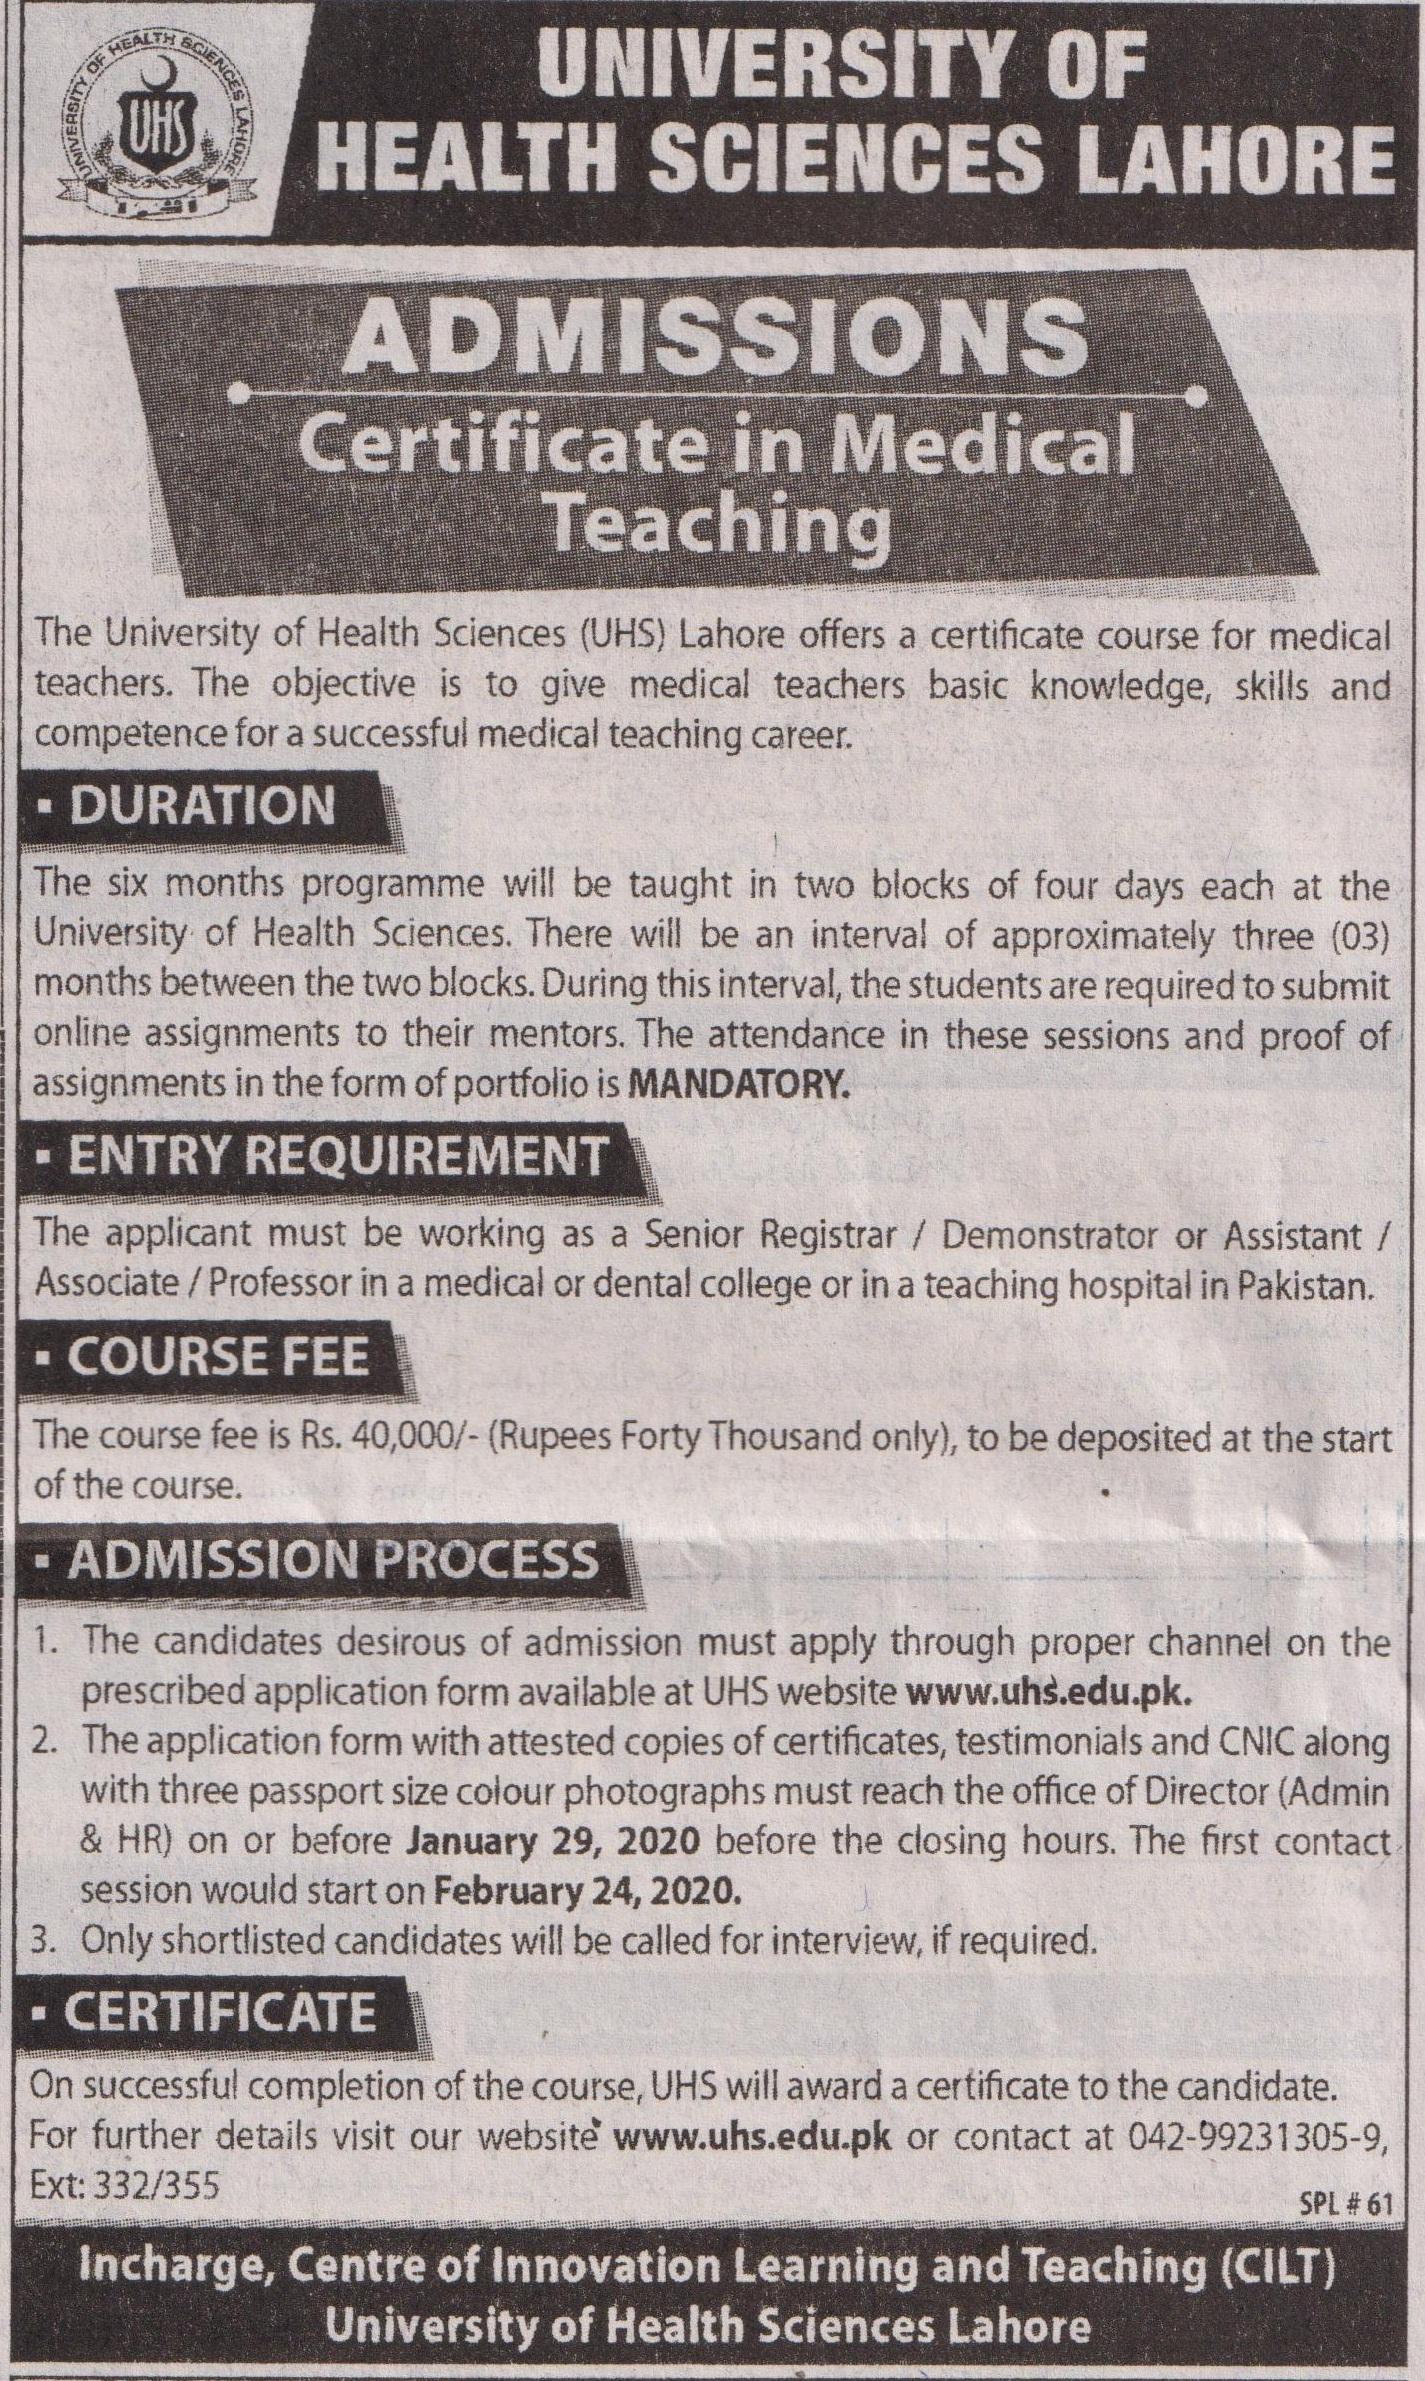 University Of Health Sciences Lahore Admissions